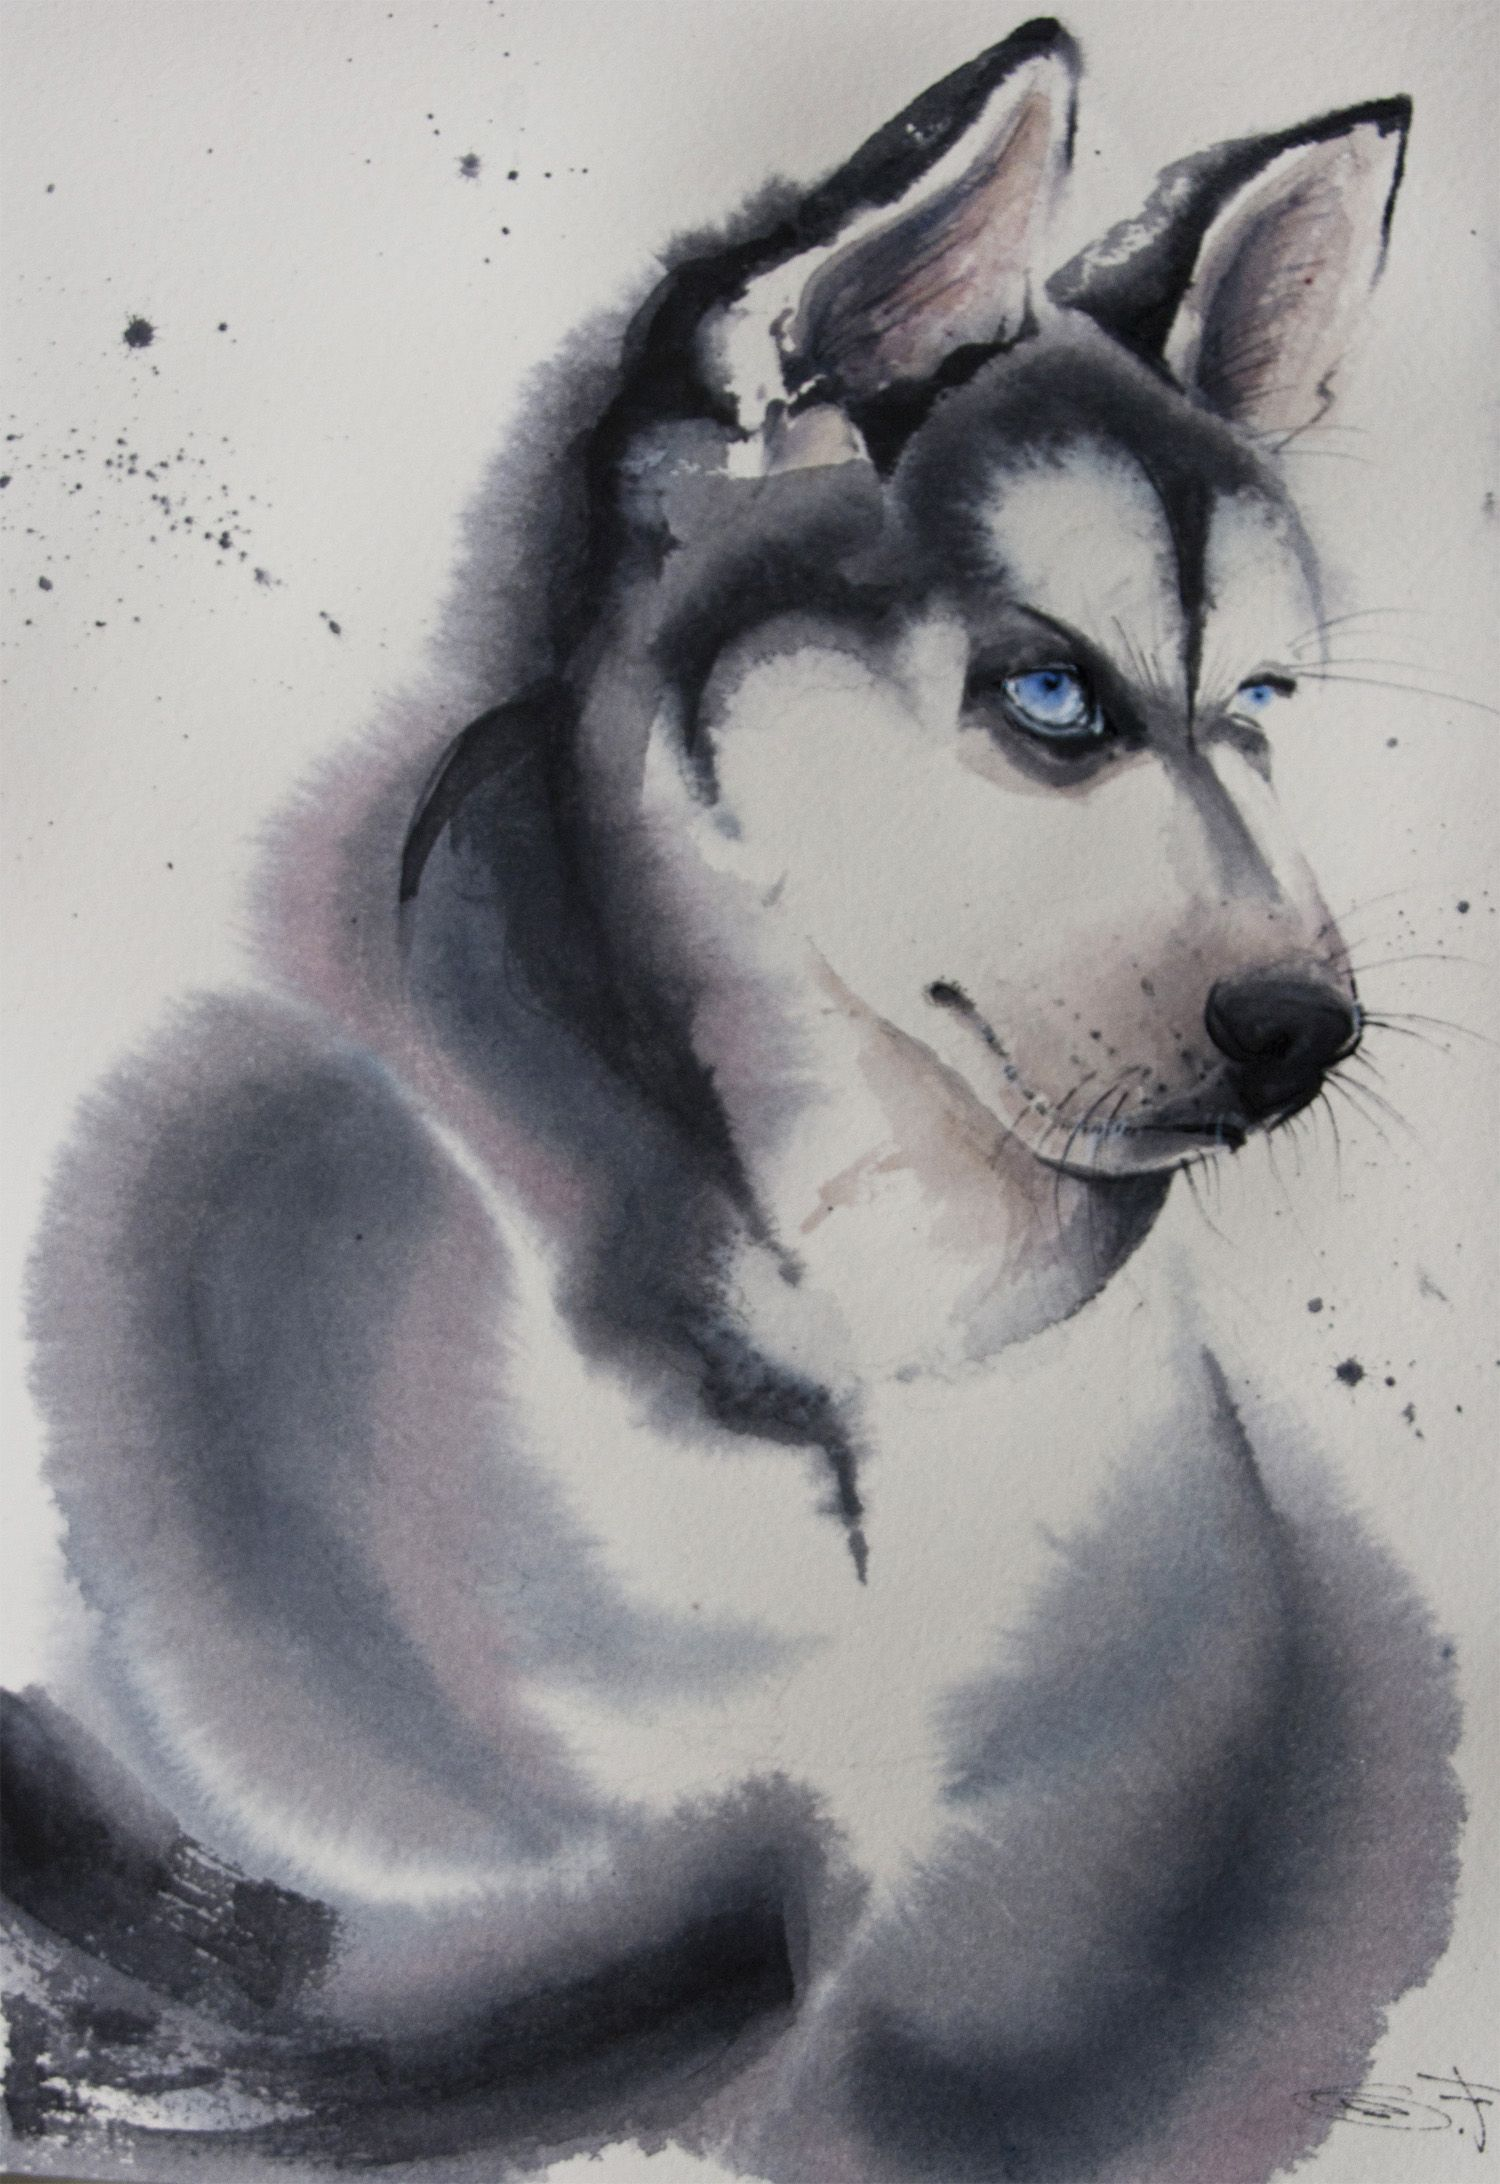 Husky The Snow Dog 5 30 21 Cm Watercolor On Paper Olga Flerova O